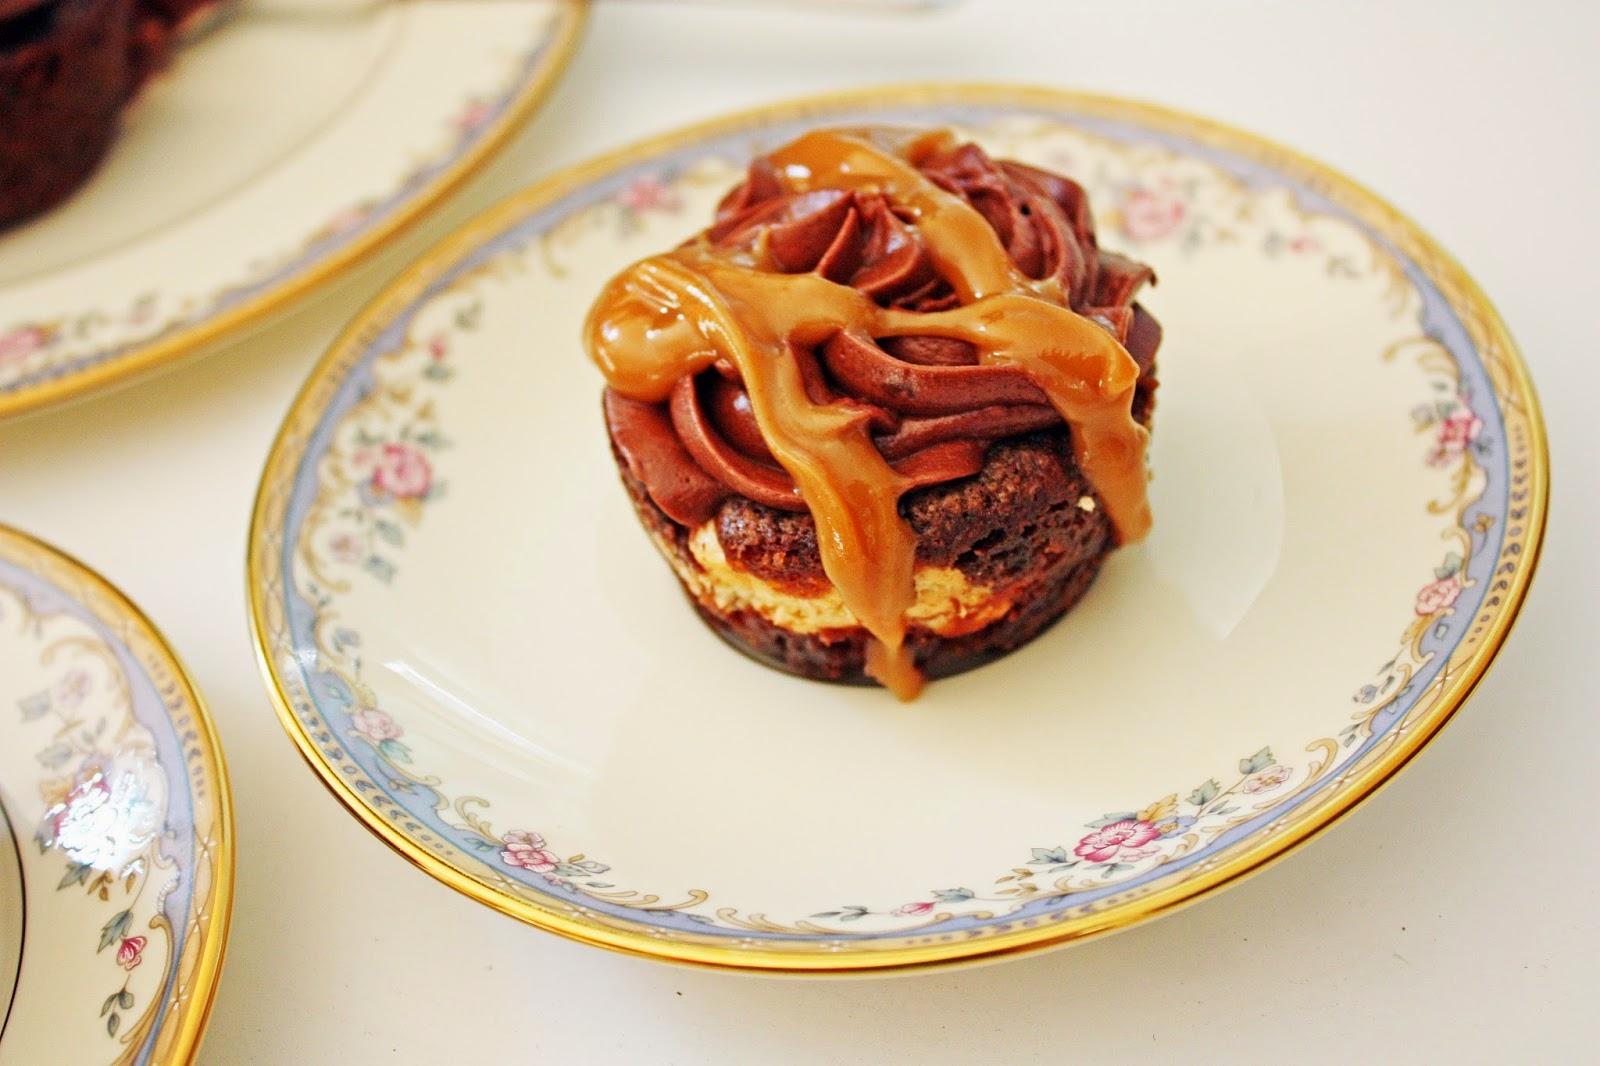 Cheesecake-stuffed mocha zucchini cupcakes with mocha frosting and peanut butter glaze